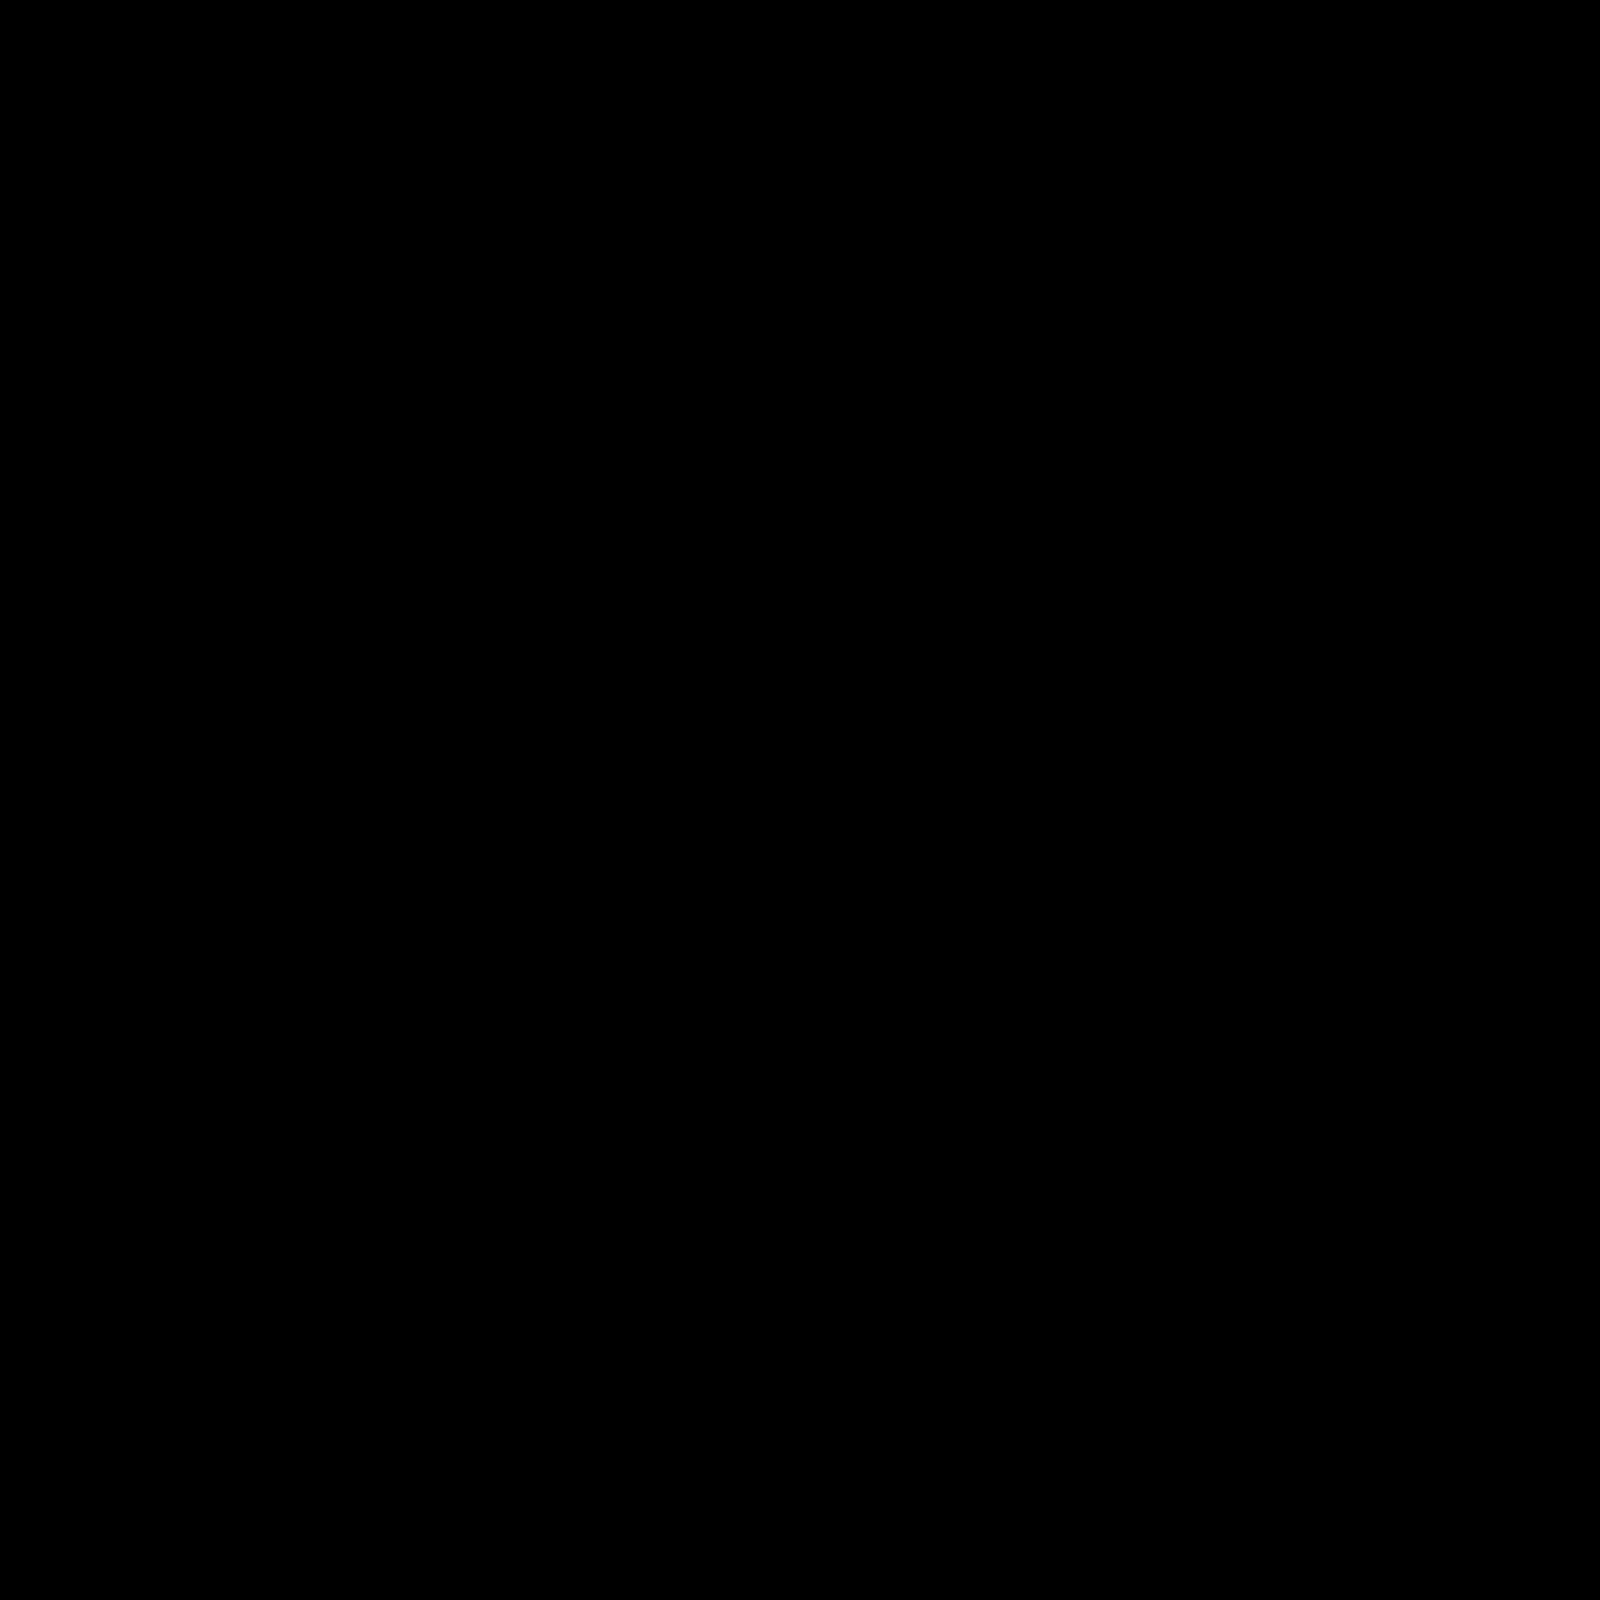 Wordpress Icon - Wordpress, Transparent background PNG HD thumbnail